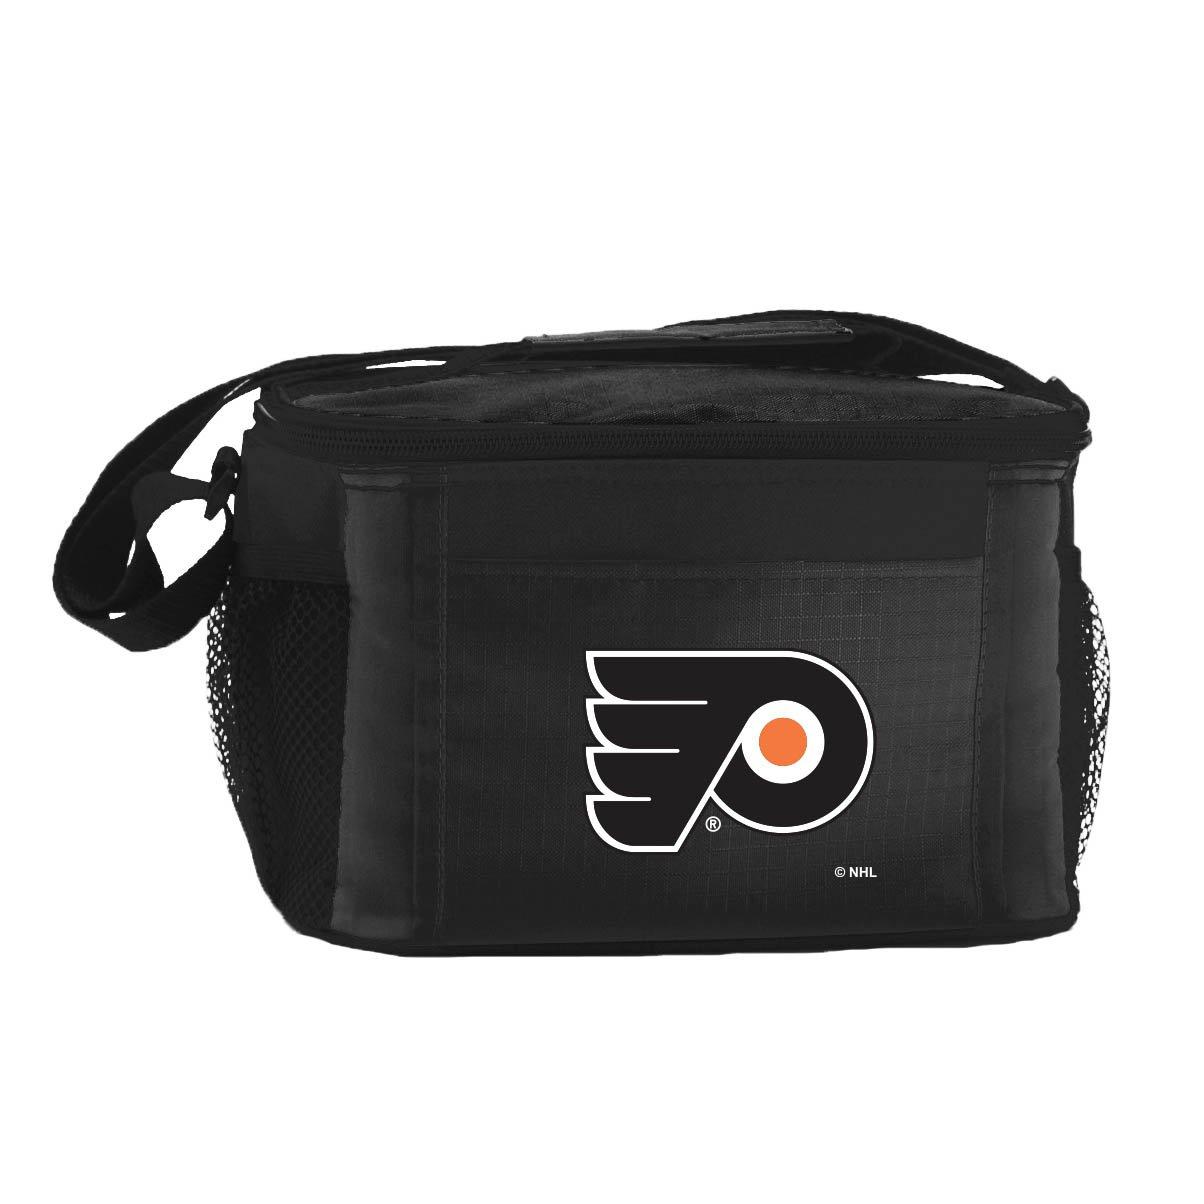 Black Kolder NHL Philadelphia Flyers Insulated Lunch Cooler Bag with Zipper Closure